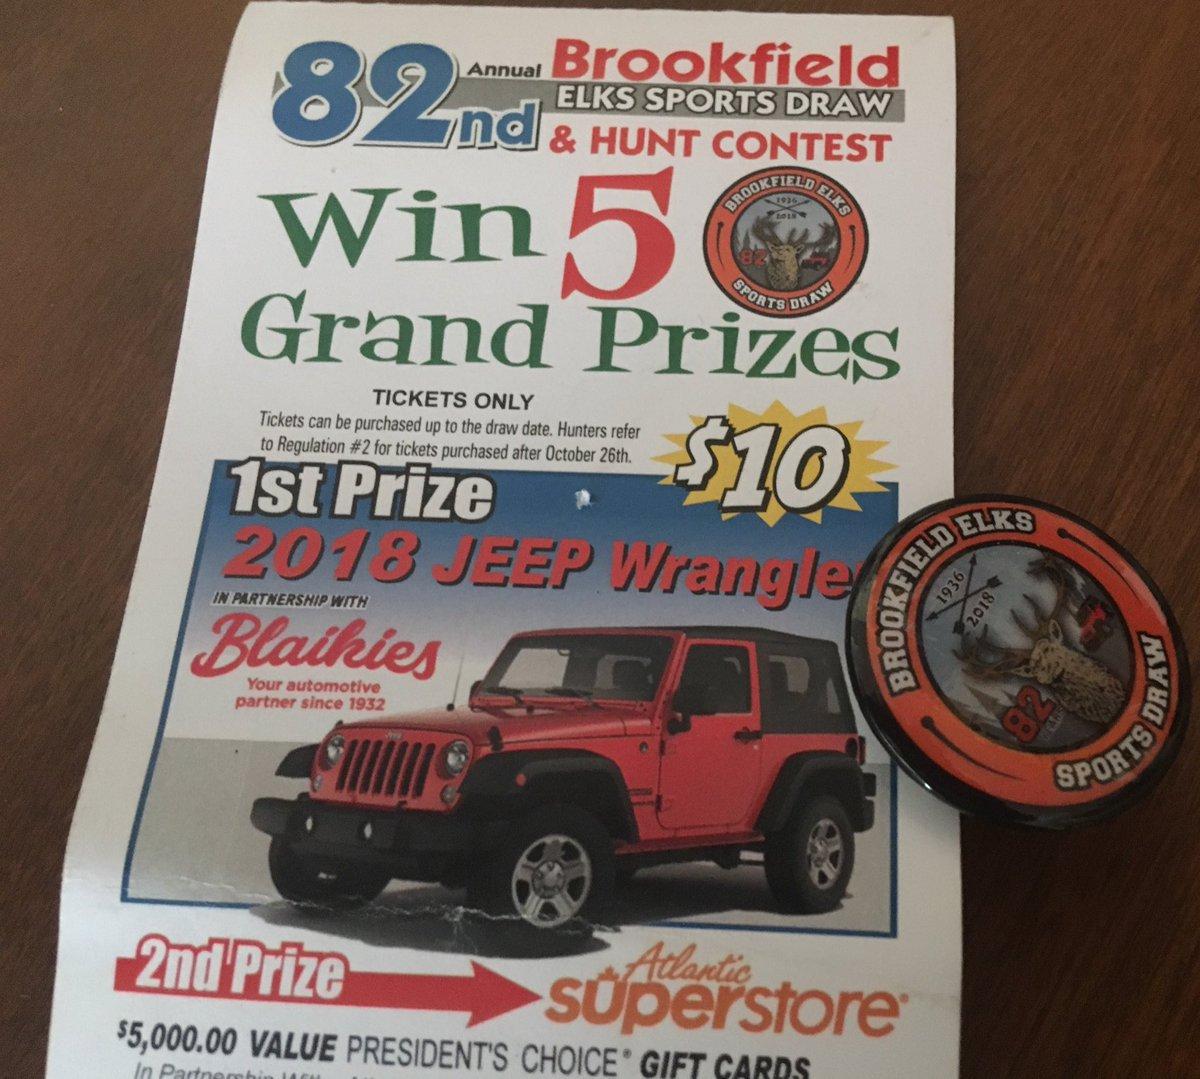 Brookfield Elks Elksfastpitch Twitter Jeep Wrangler Draw 0 Replies 2 Retweets 7 Likes